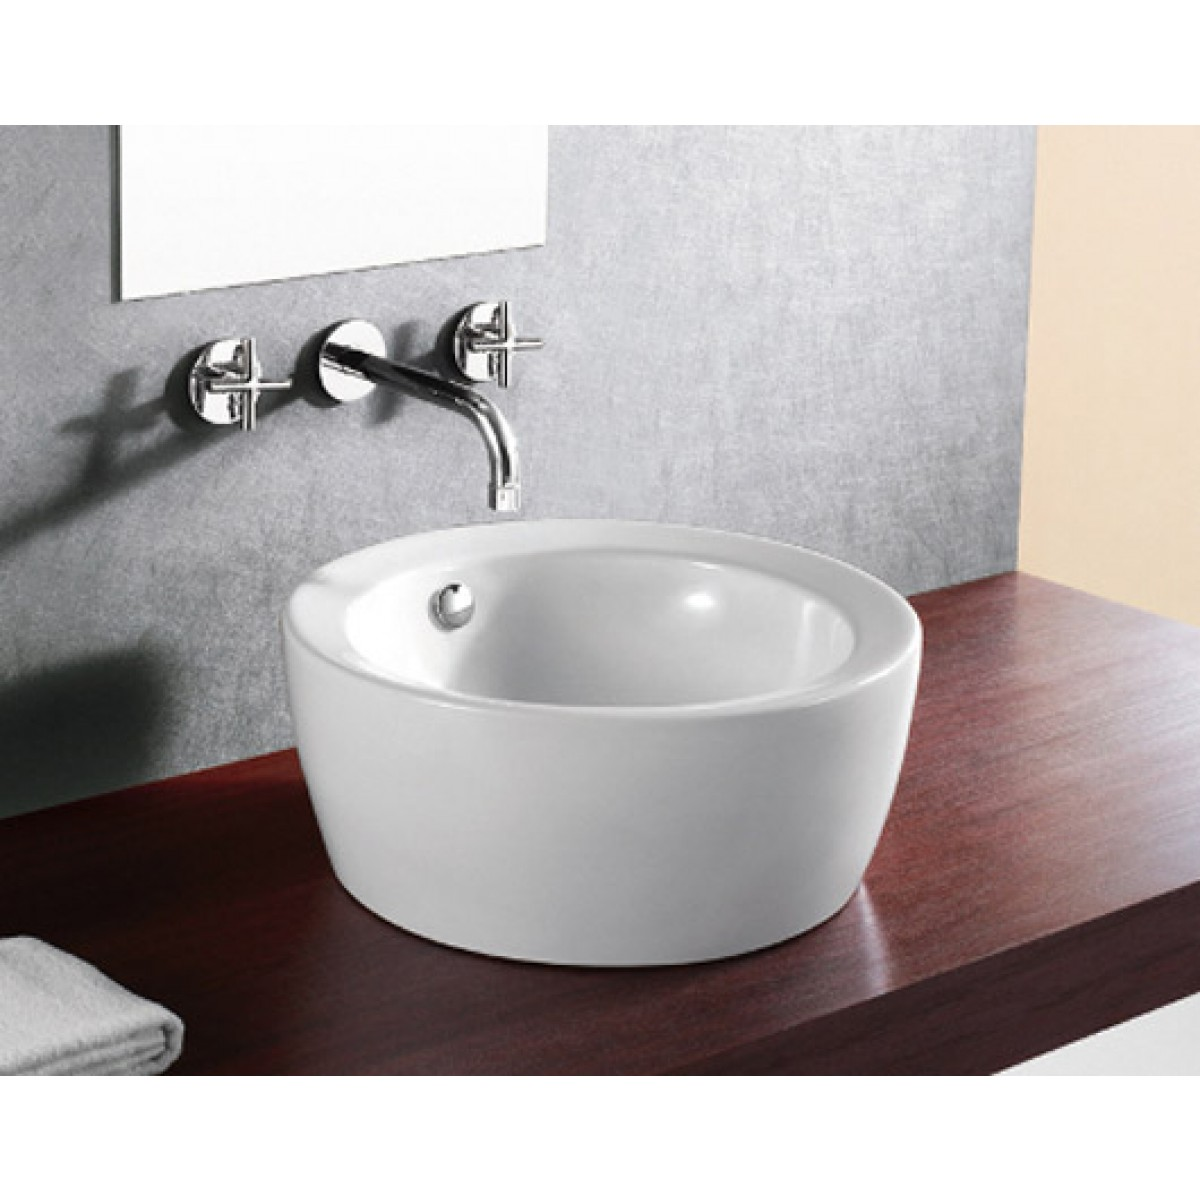 Round Porcelain Ceramic Countertop Bathroom Vessel Sink